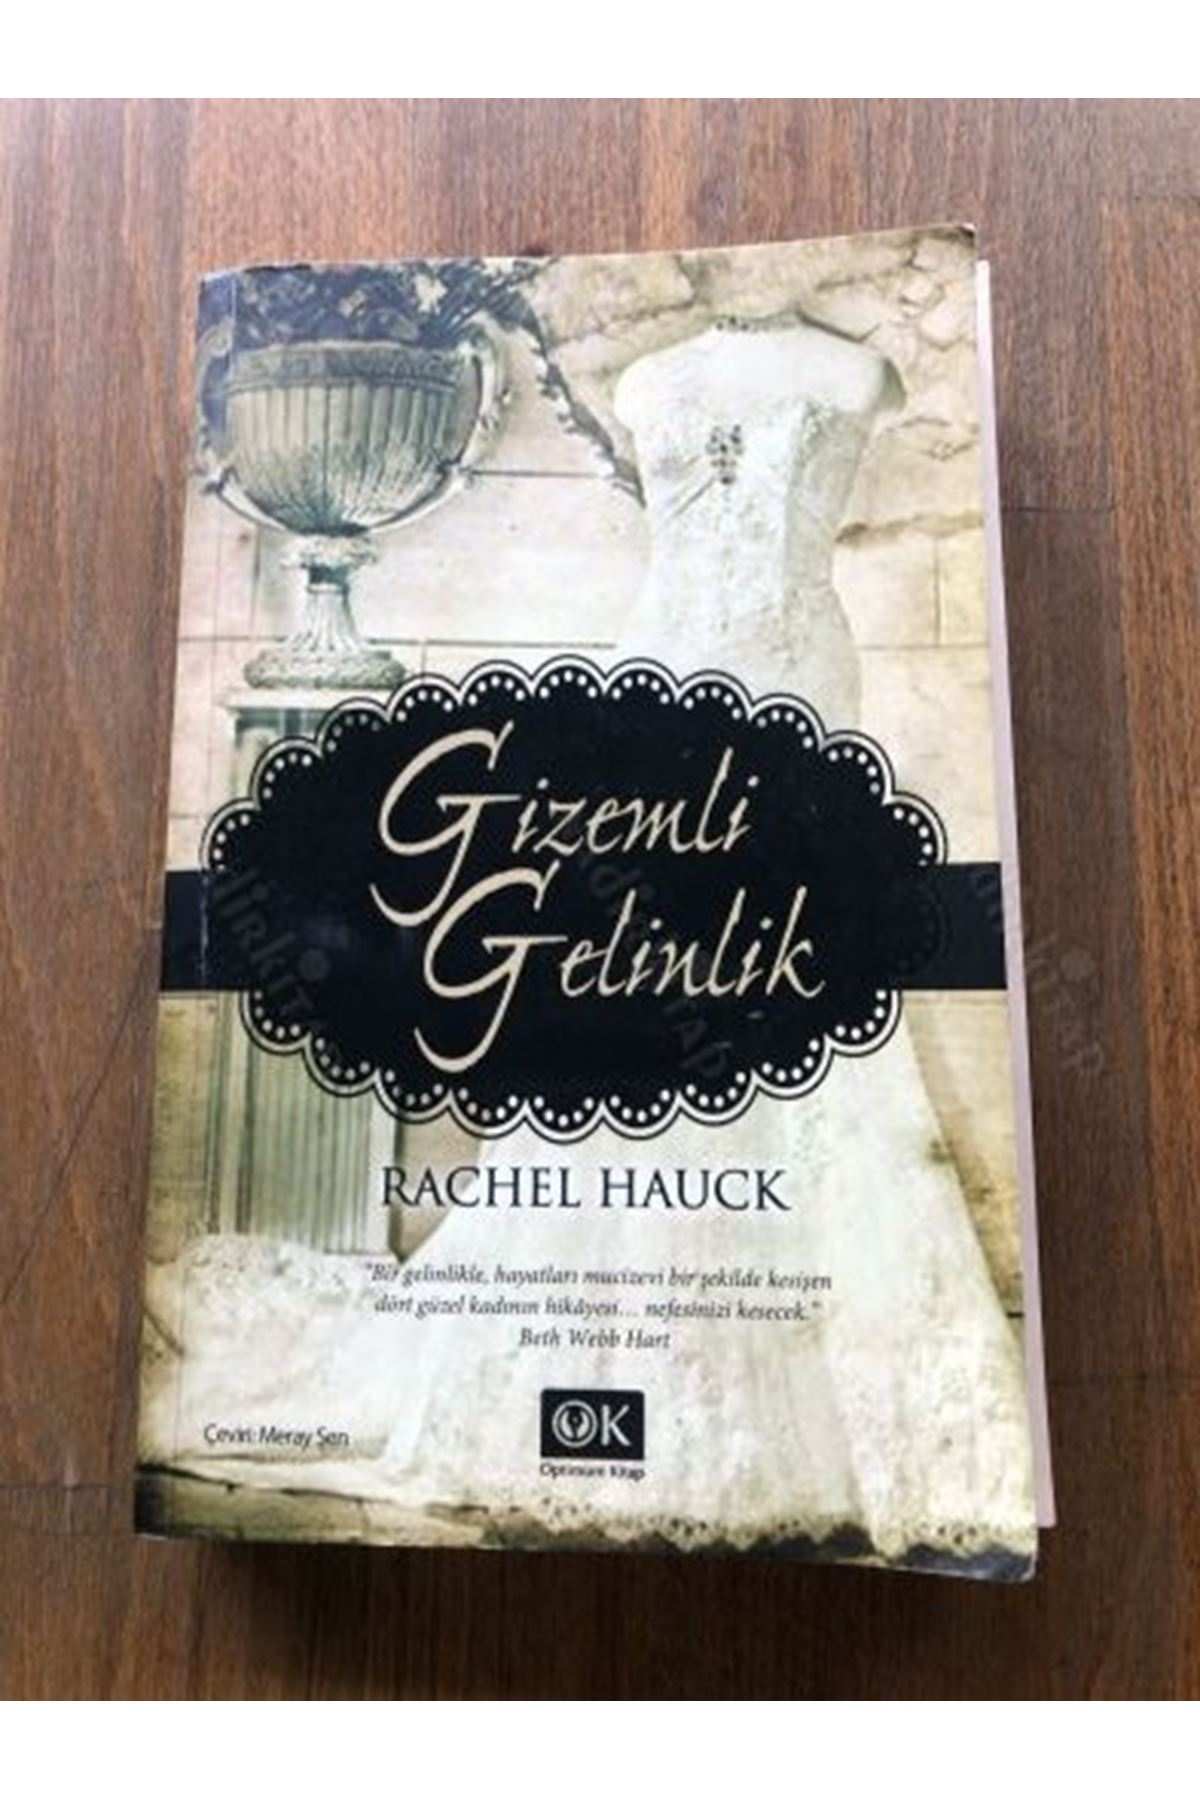 RACHEL HAUCK - GİZEMLİ GELİNLİK